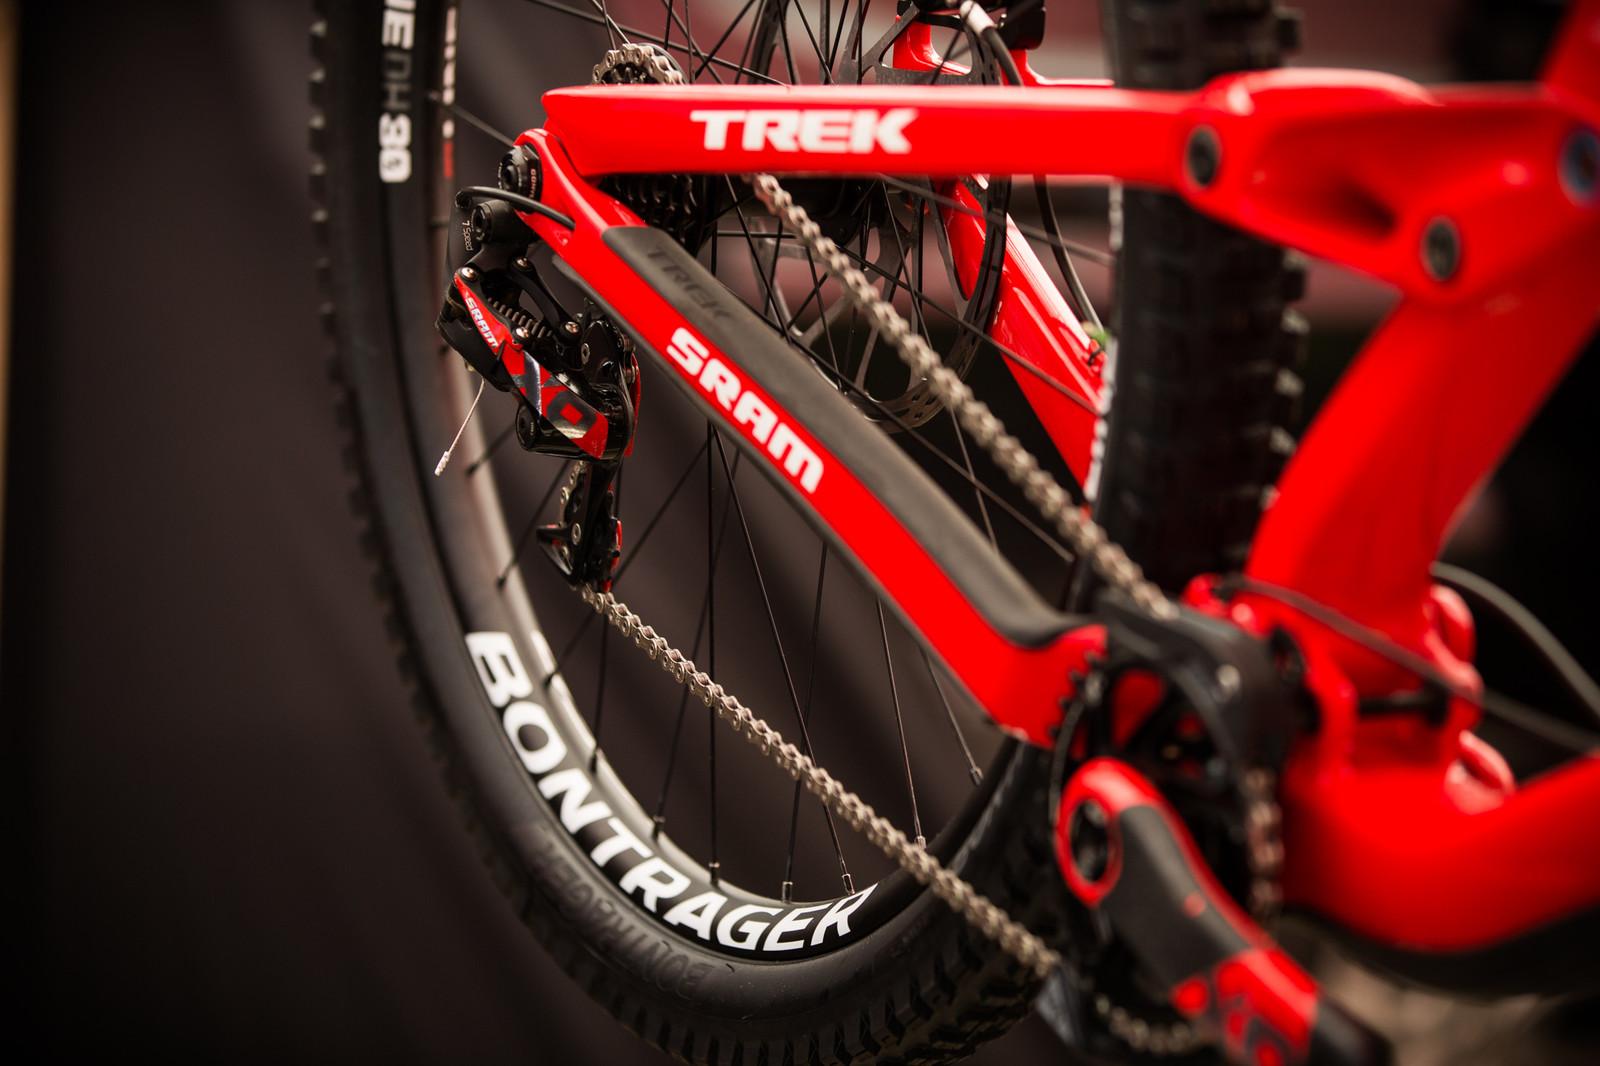 Trek Factory Racing's SRAM X0 DH Drivetrain - PIT BITS - iXS Cup Maribor - Mountain Biking Pictures - Vital MTB